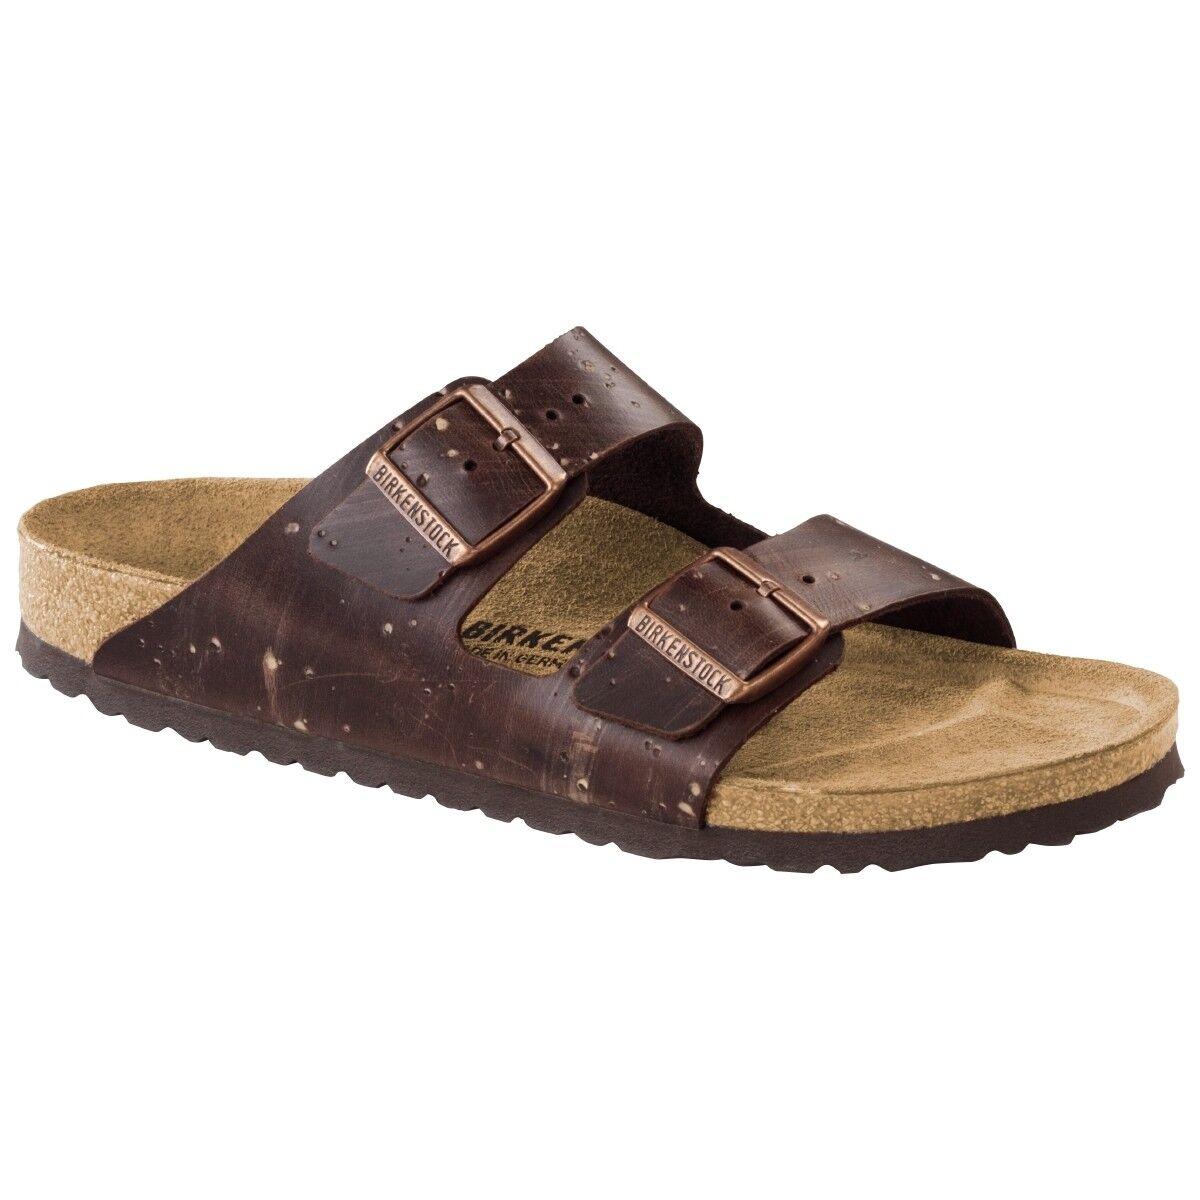 Birkenstock arizona nubukleder zapatos sandalia Brown ancho Silver normal 1006576